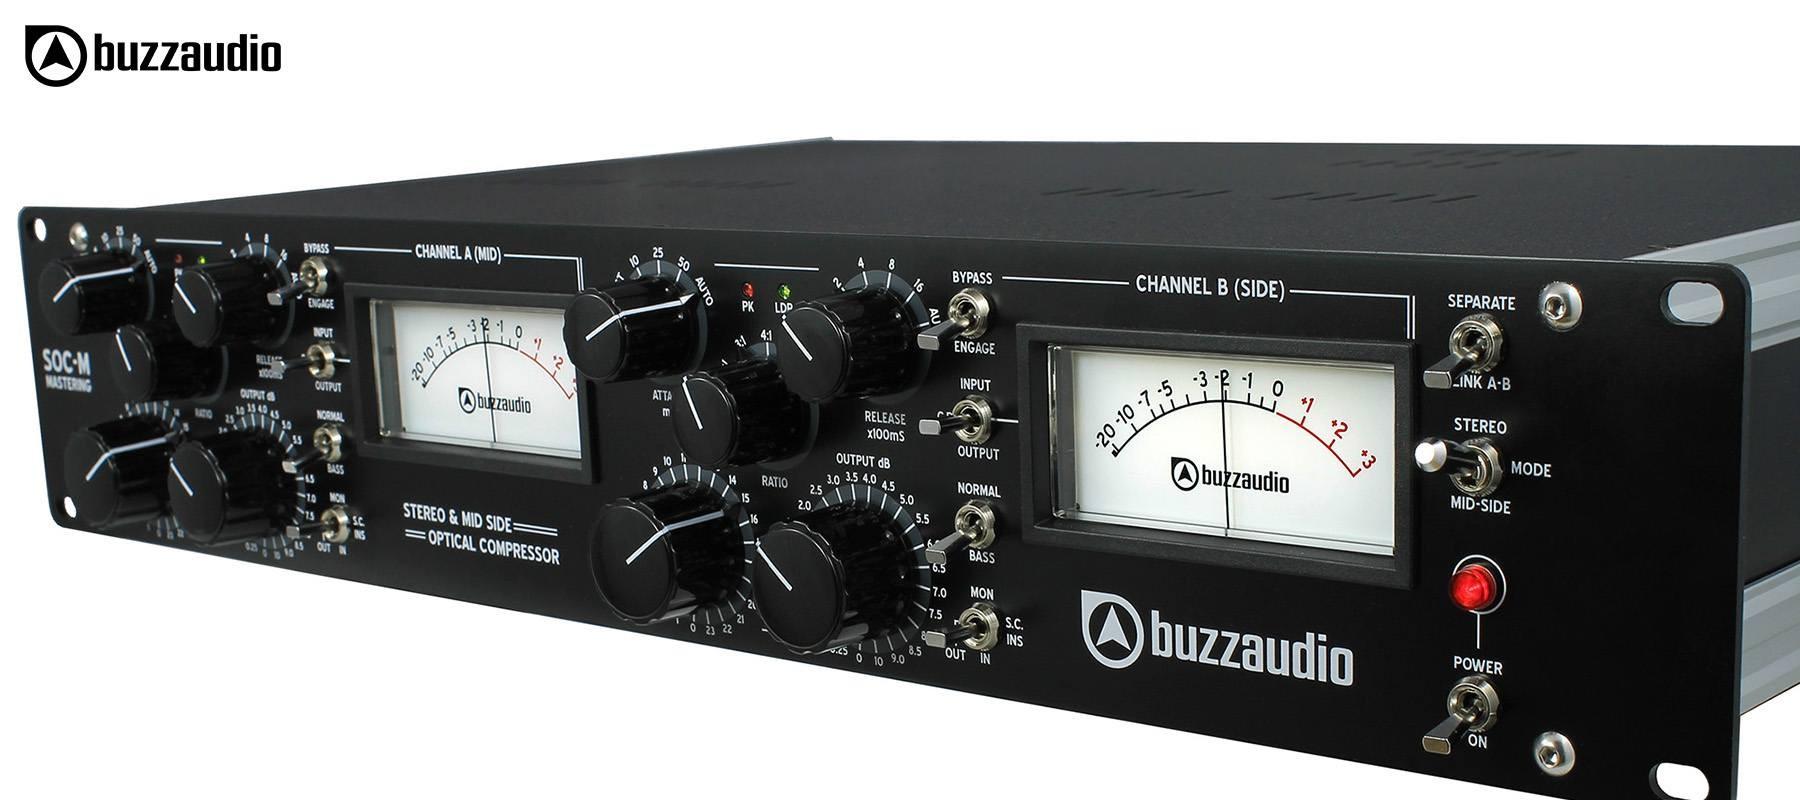 Buzz Audio SOC-M - Black face right